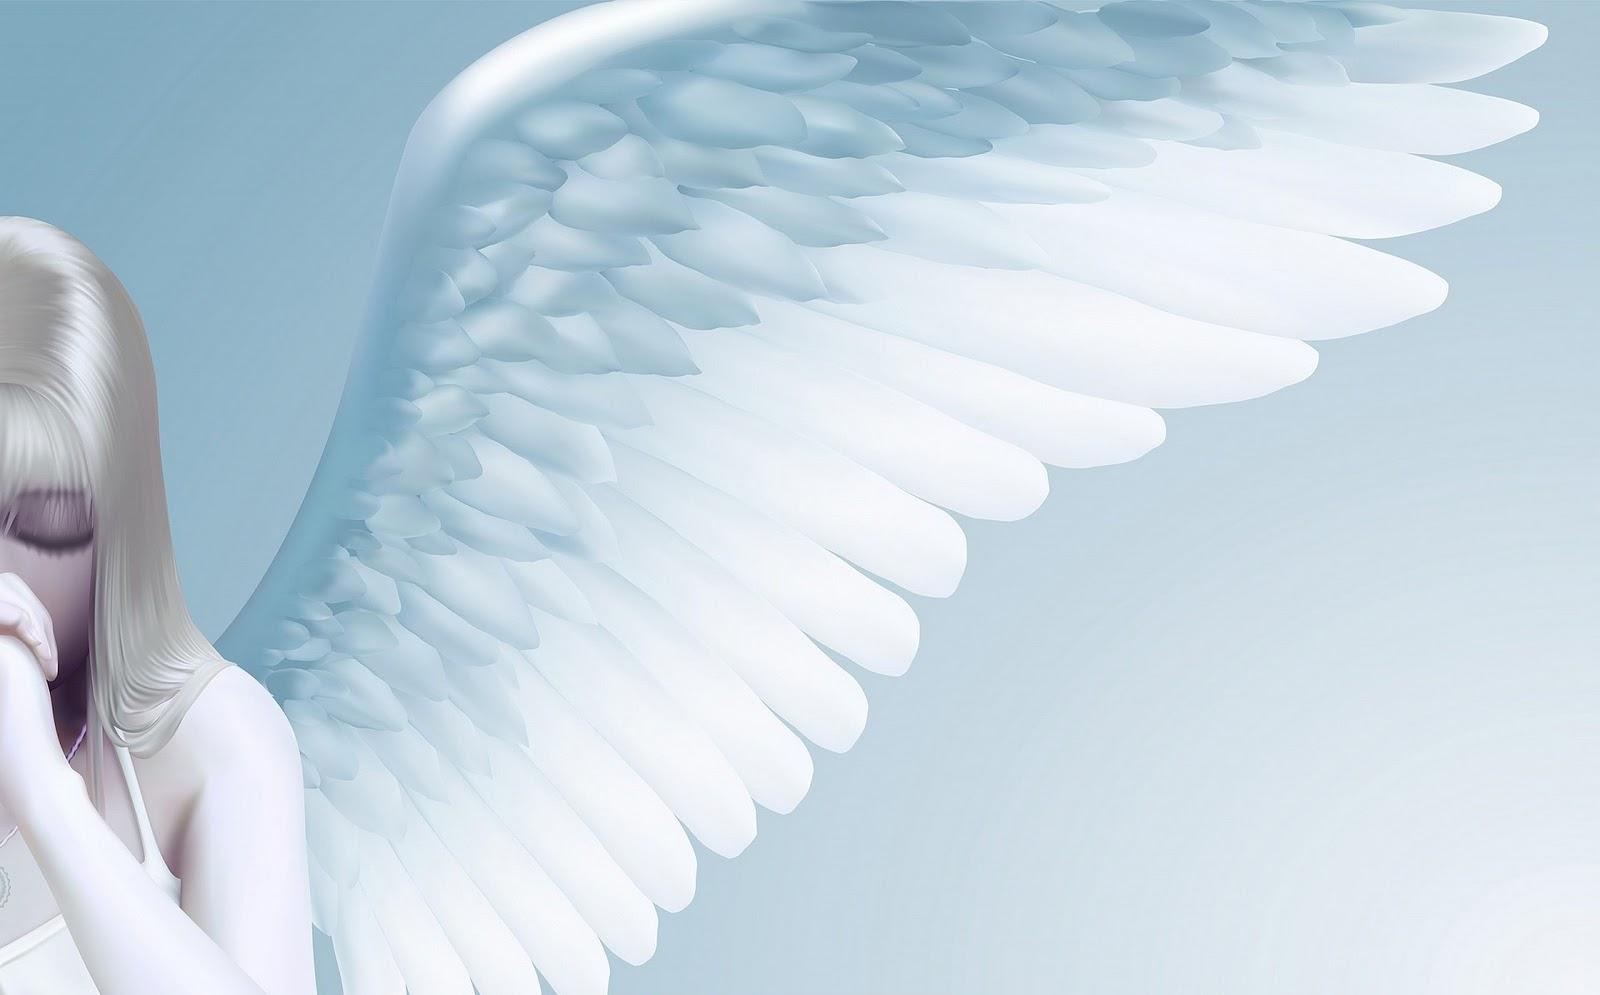 best wallpaper collection best angel wallpapers